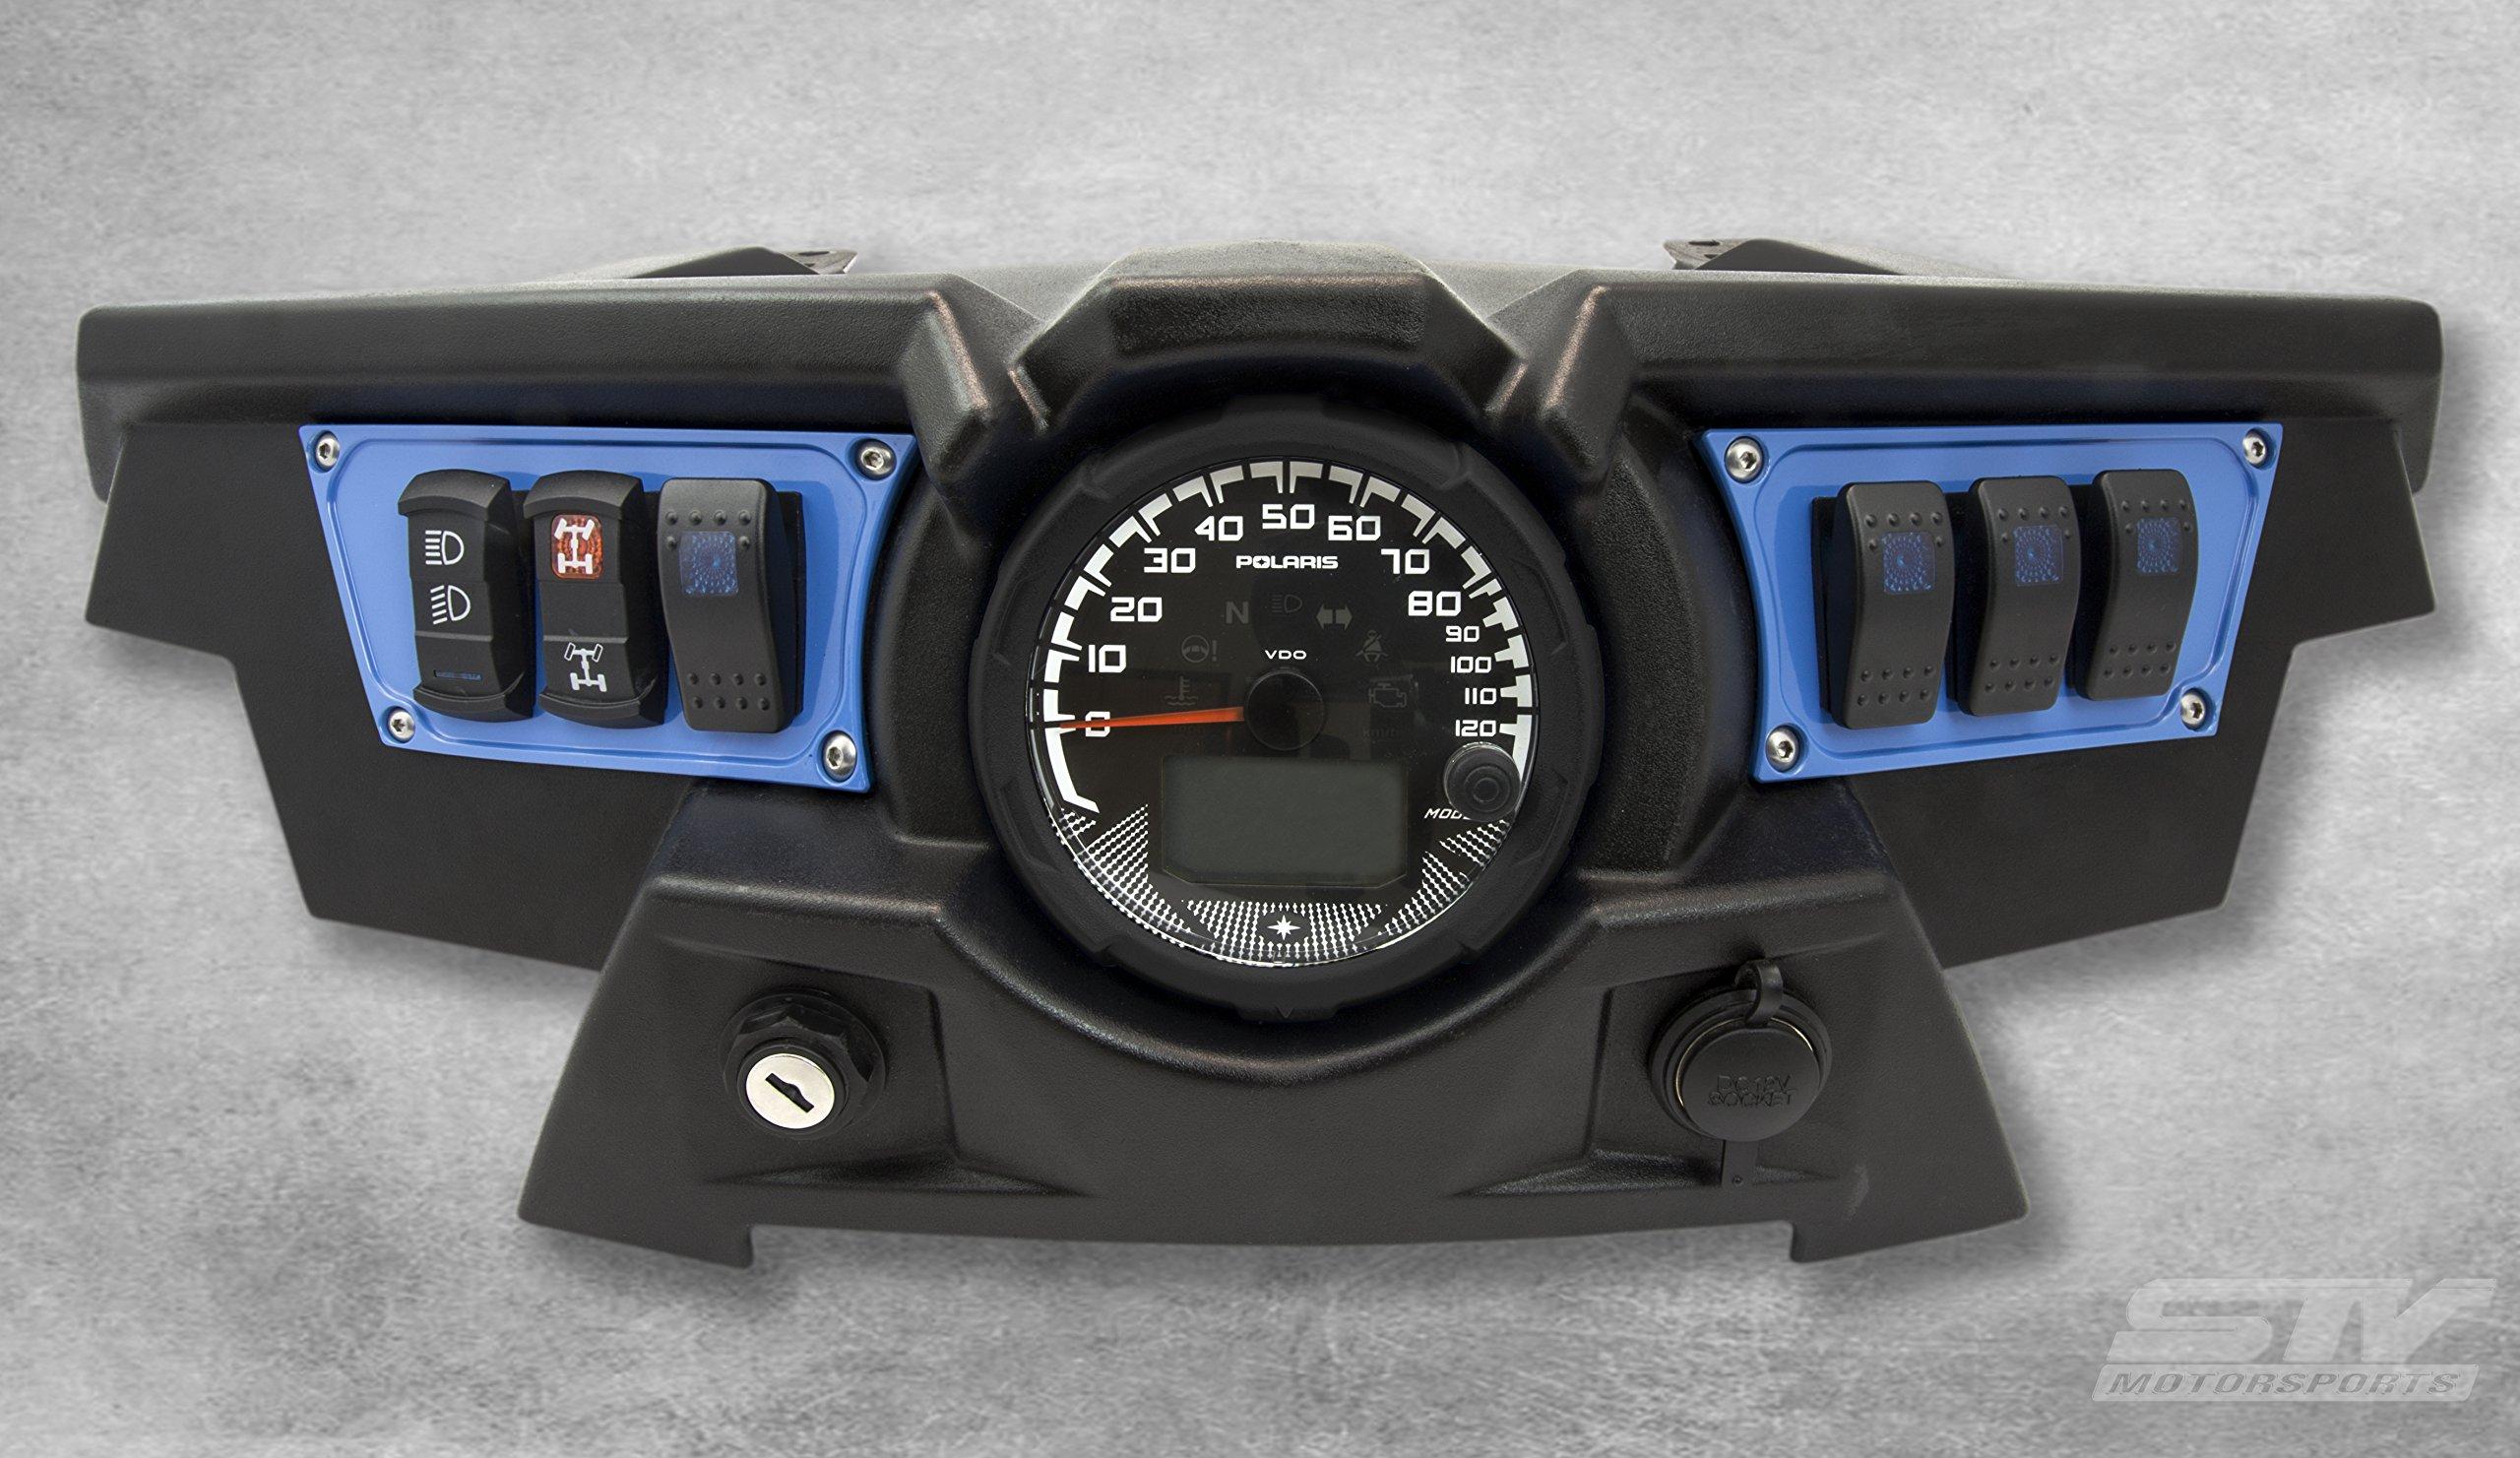 STV Motorsports Custom Aluminum Blue Dash Panel for Polaris RZR XP 1000 with 4 Free Rocker Switches